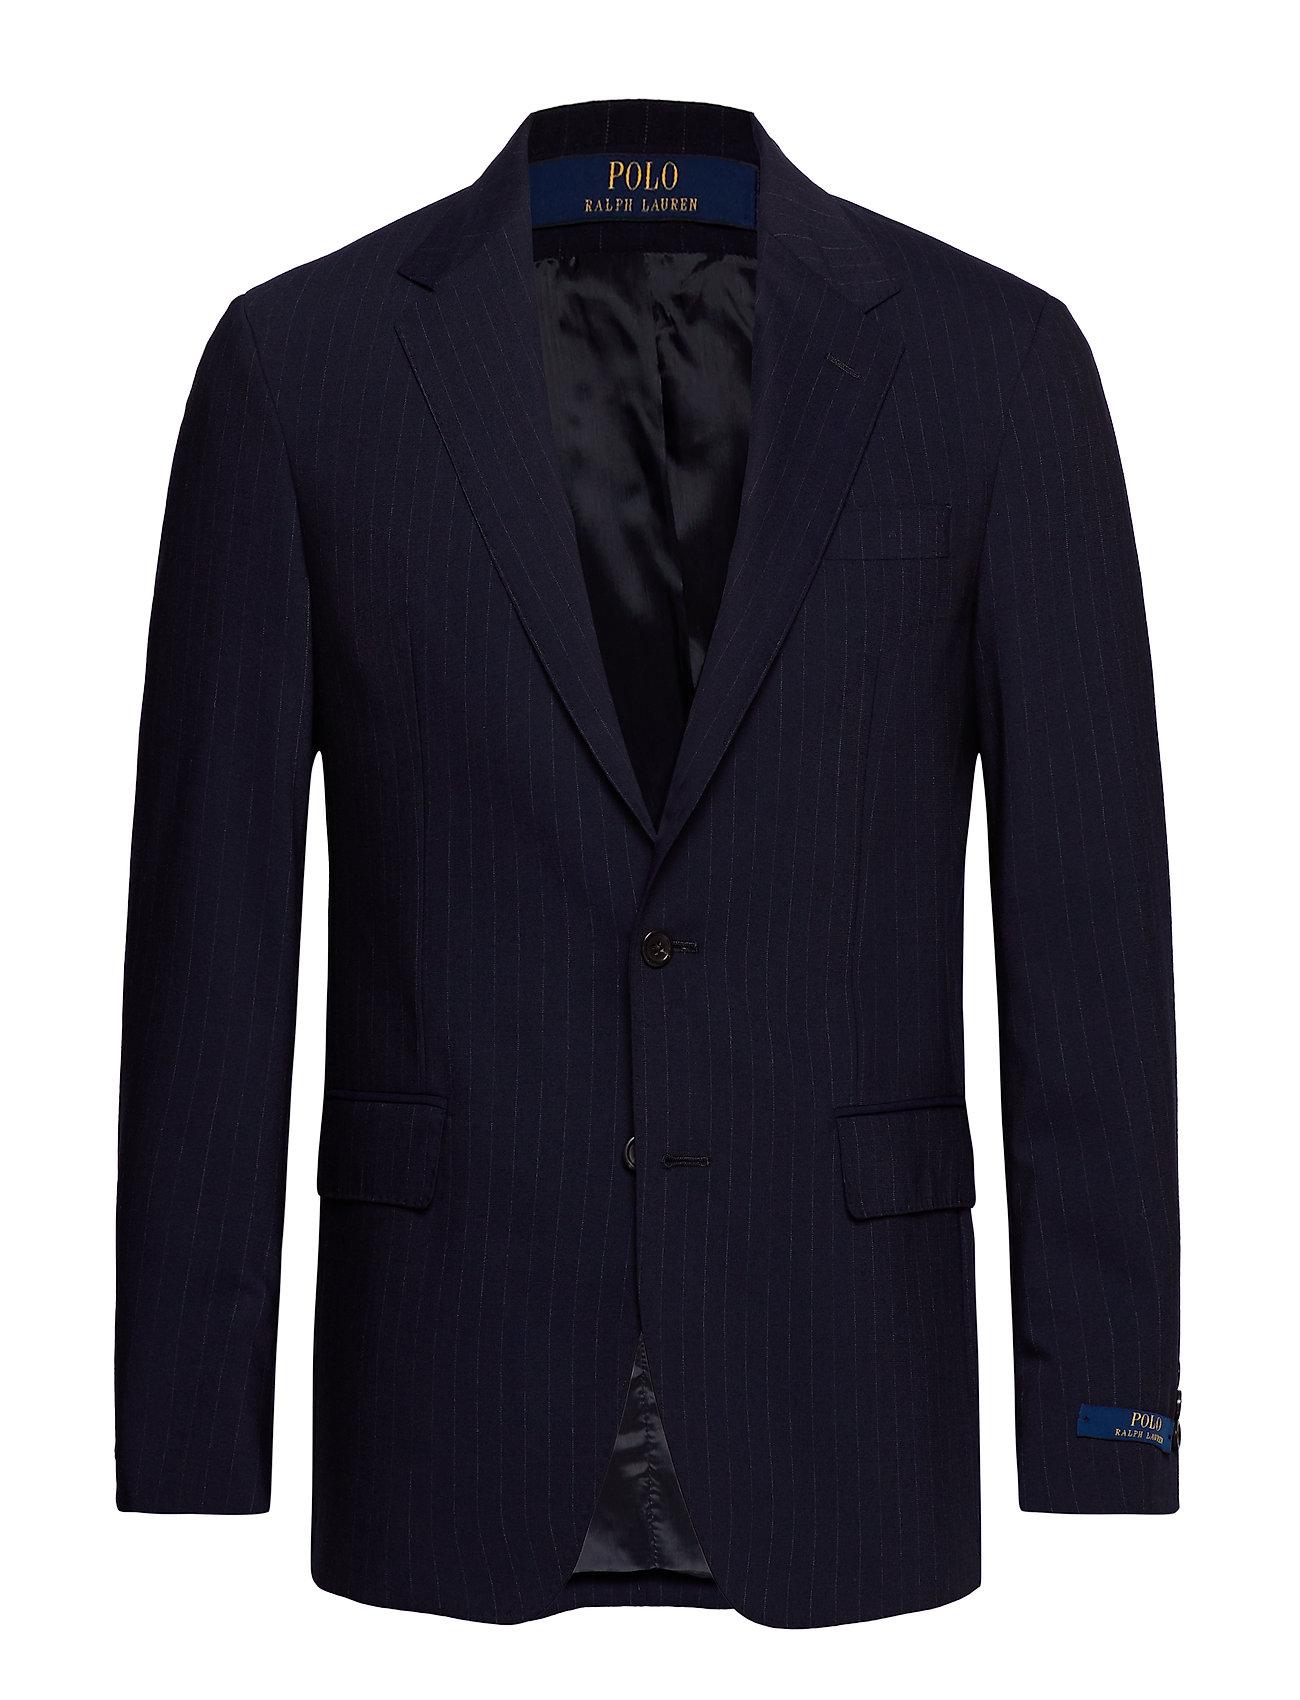 Polo Ralph Lauren Polo Wool-Blend Suit Jacket - NAVY/GREY